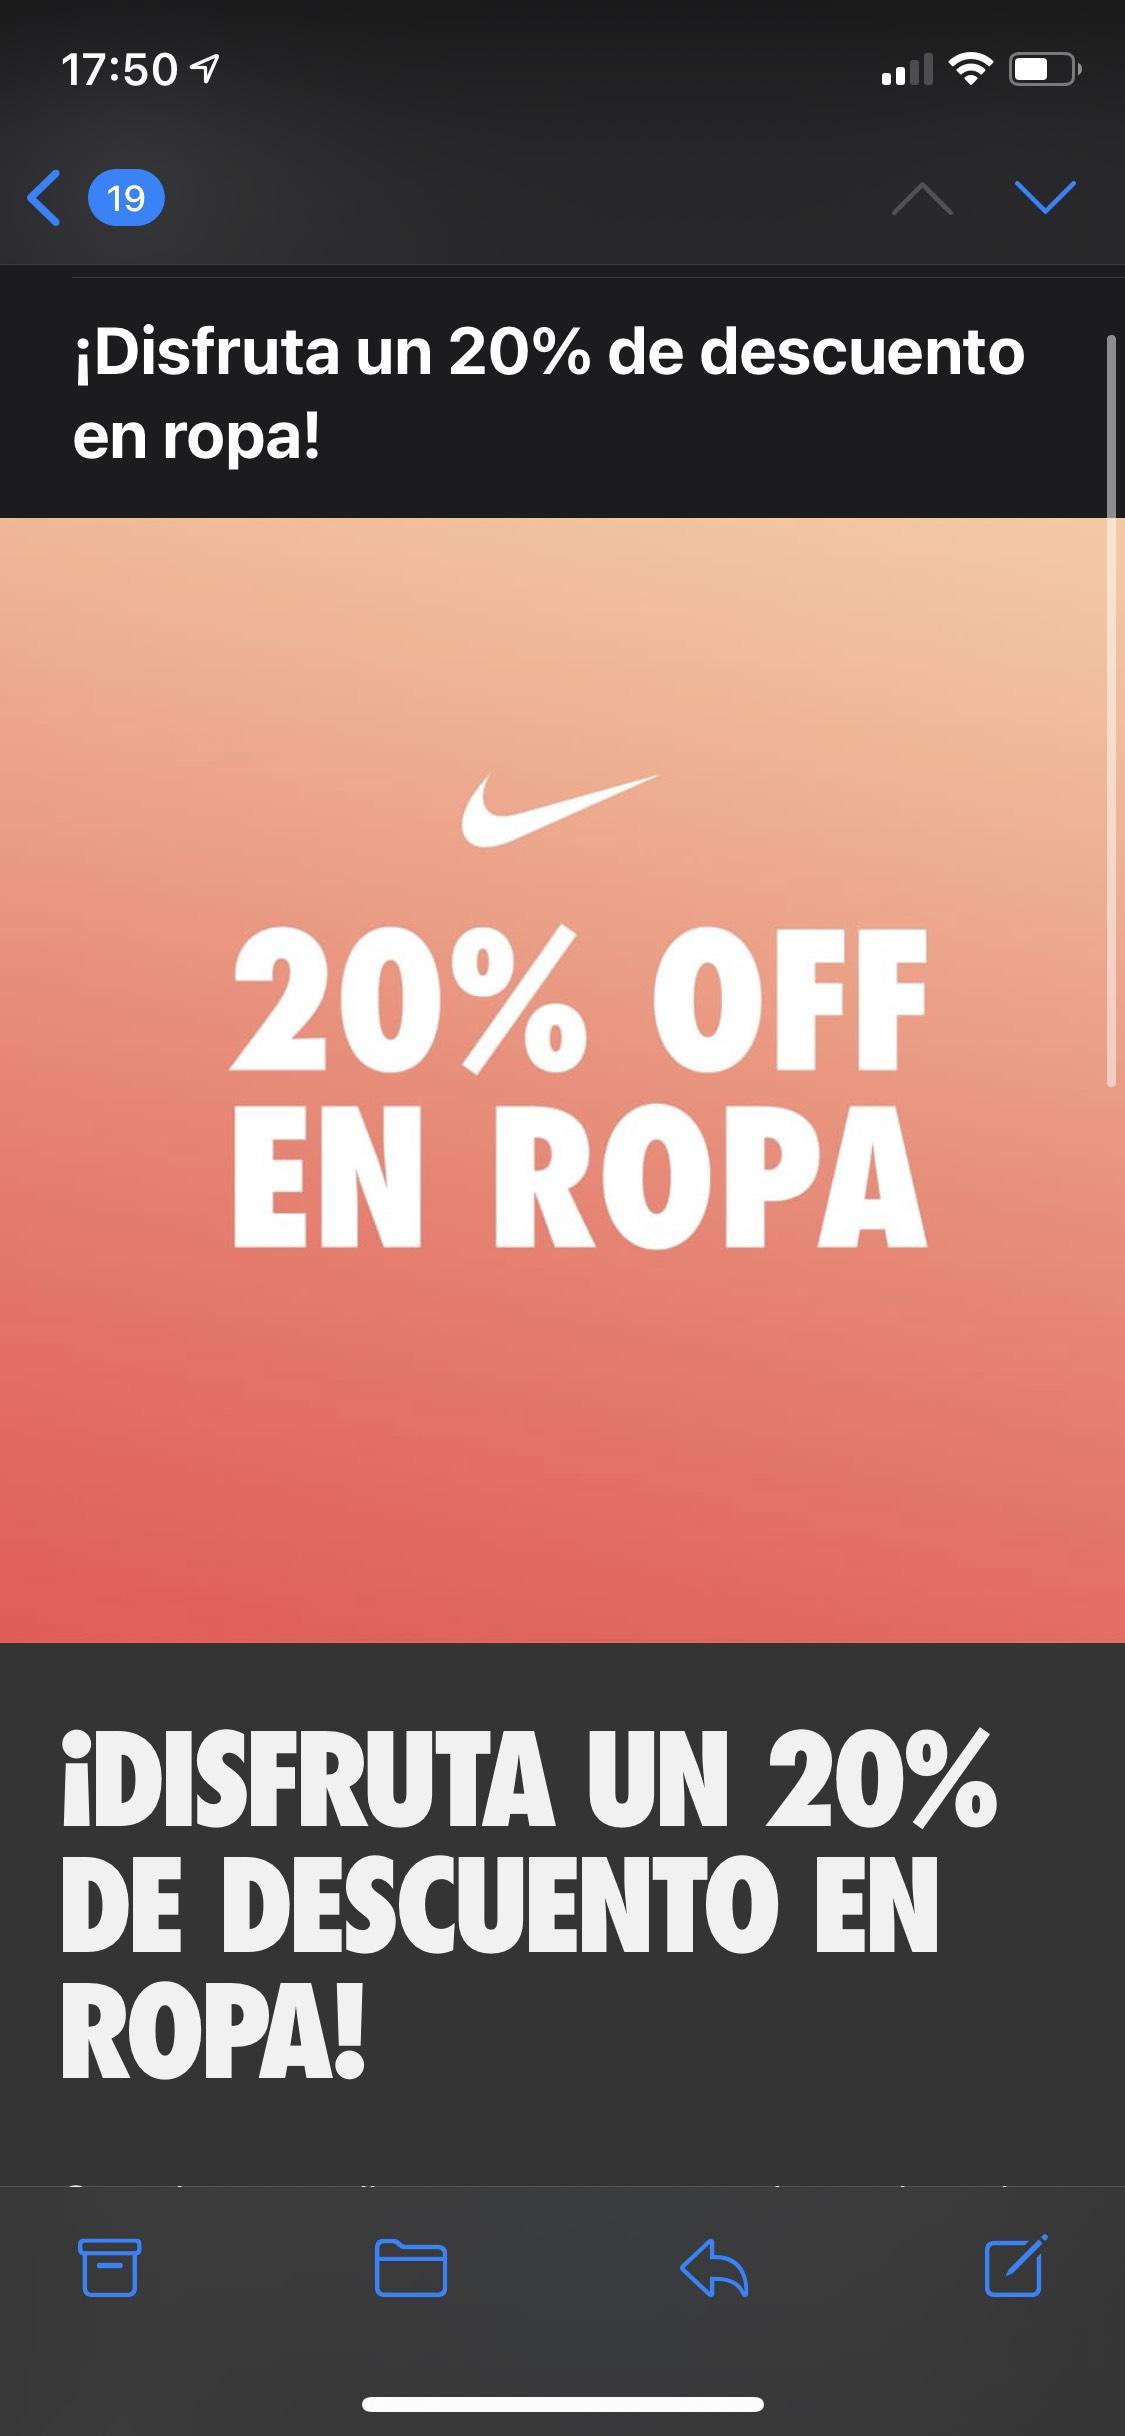 Nike: 20% de descuento en ropa + 10% adicional para miembros (con cupón)